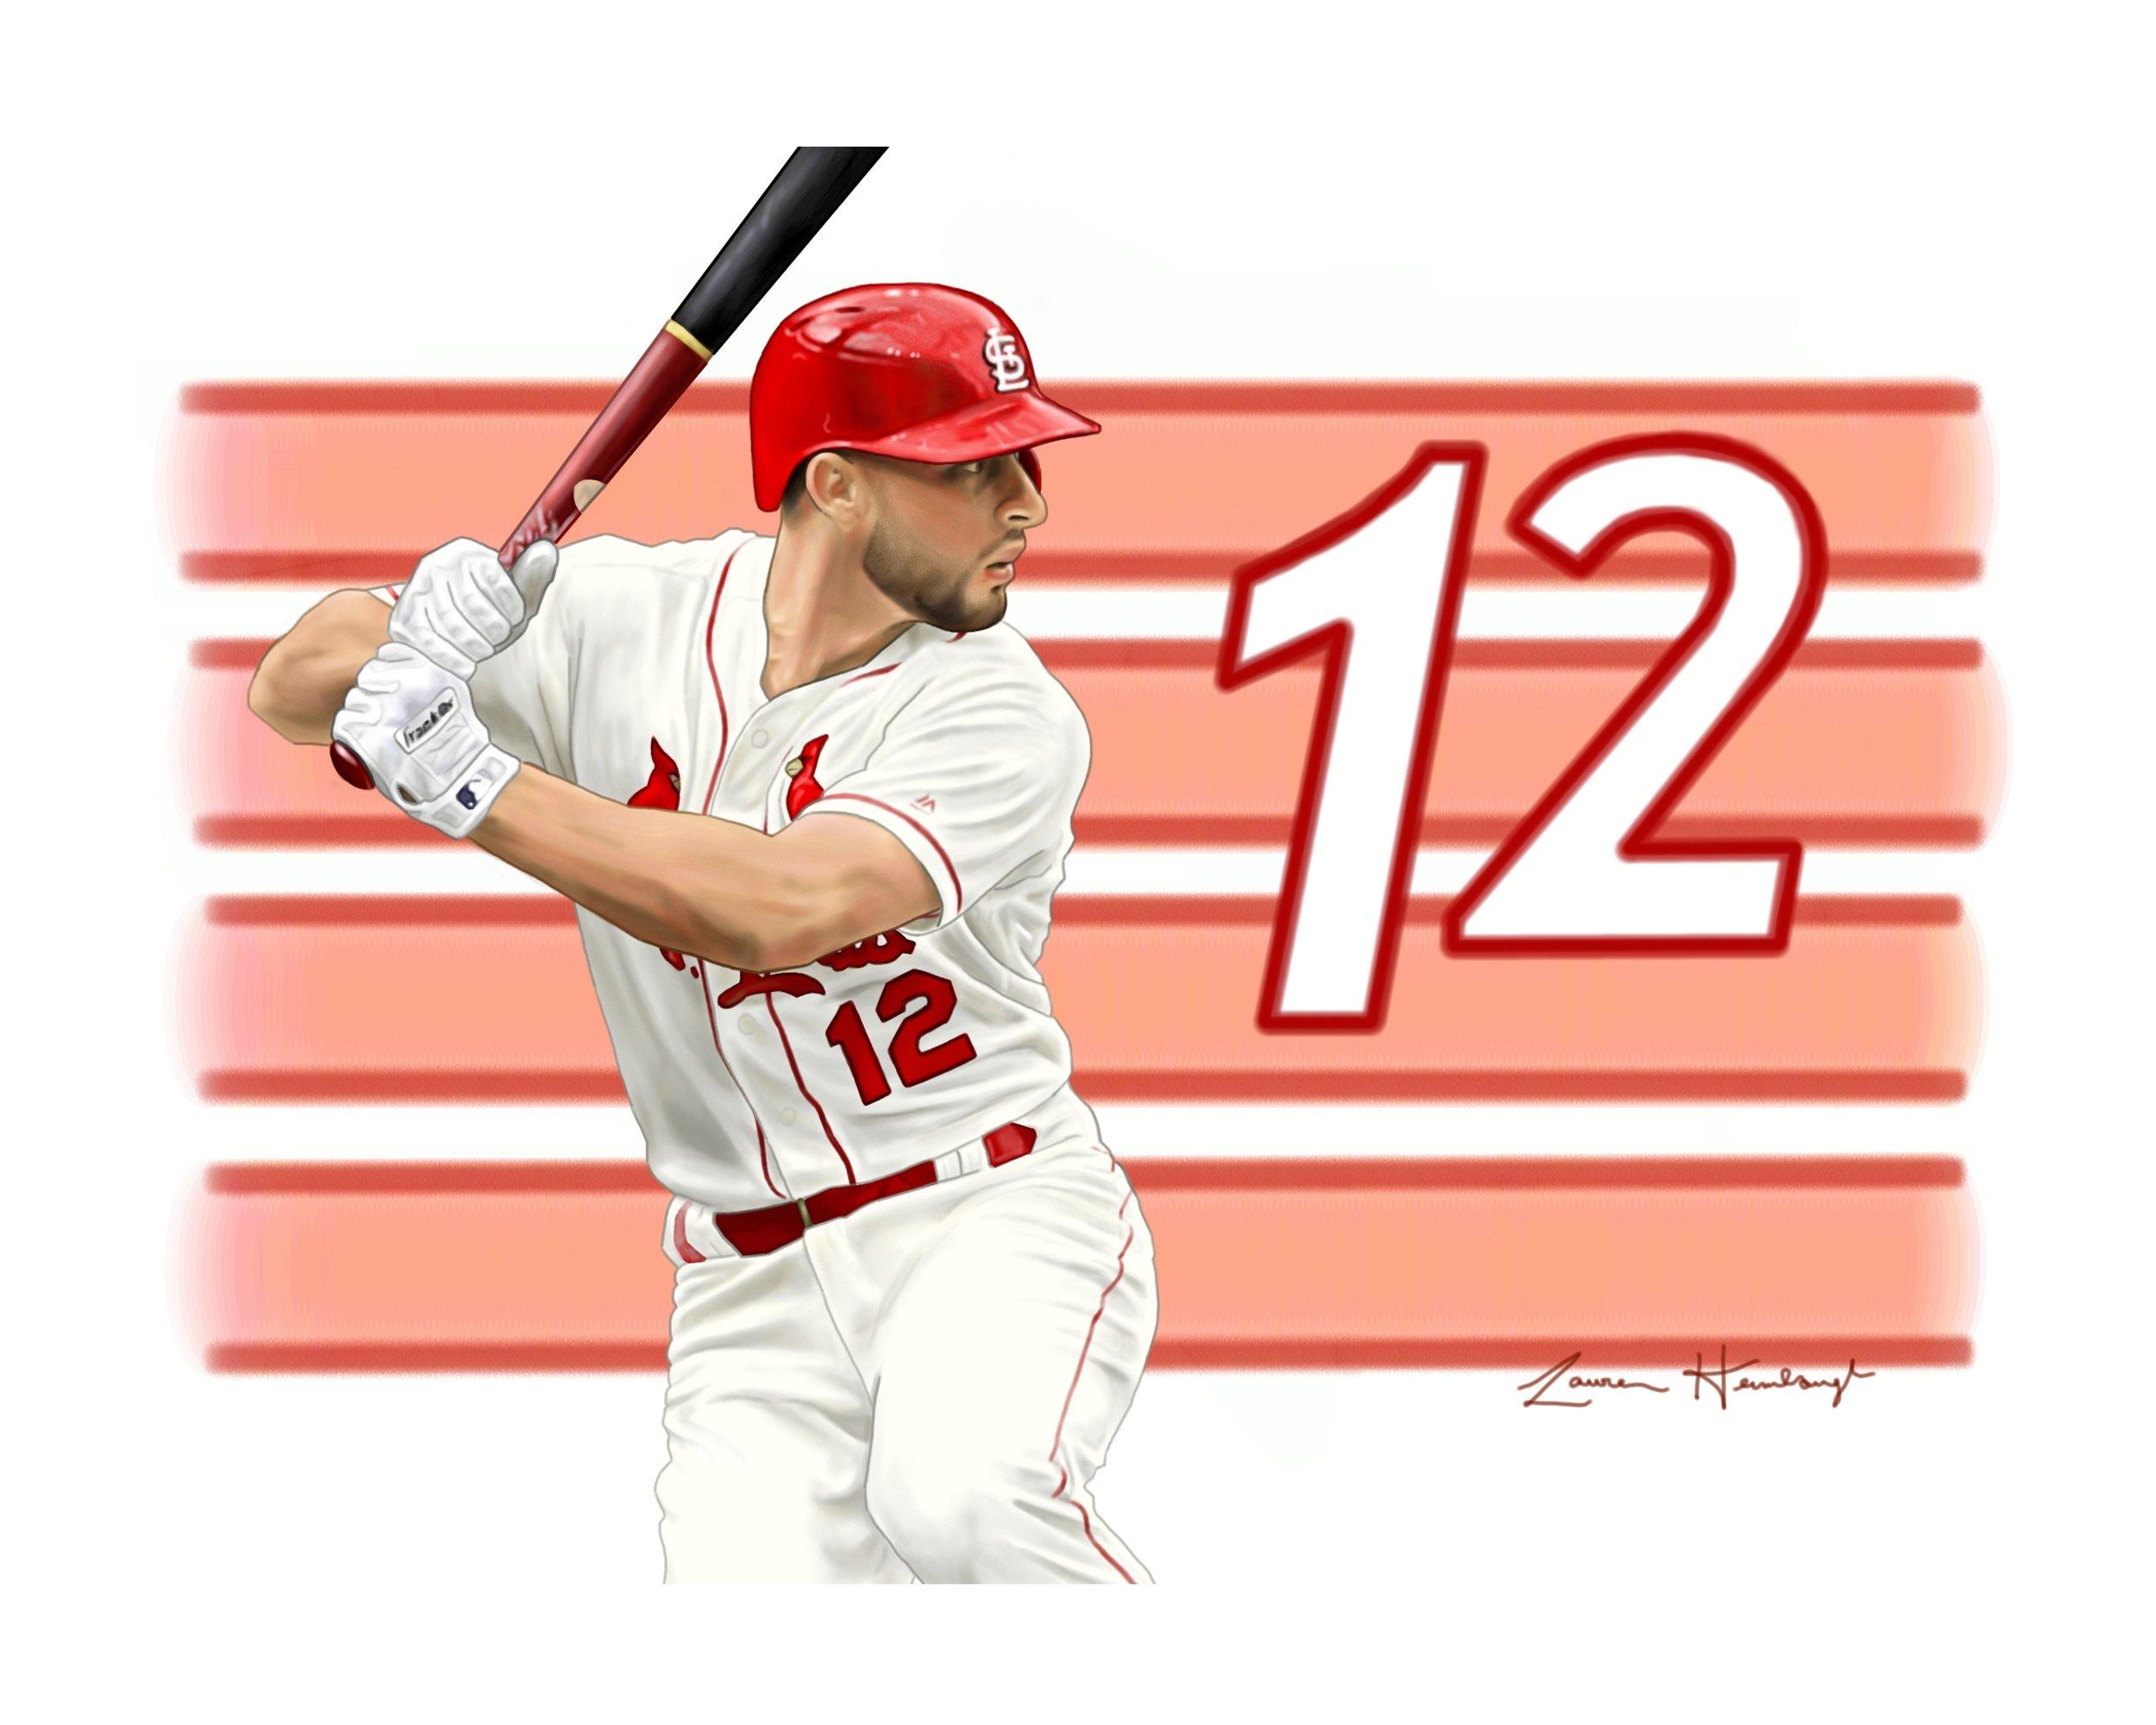 Paul DeJong - St. Louis Cardinals' Shortstop (2019)